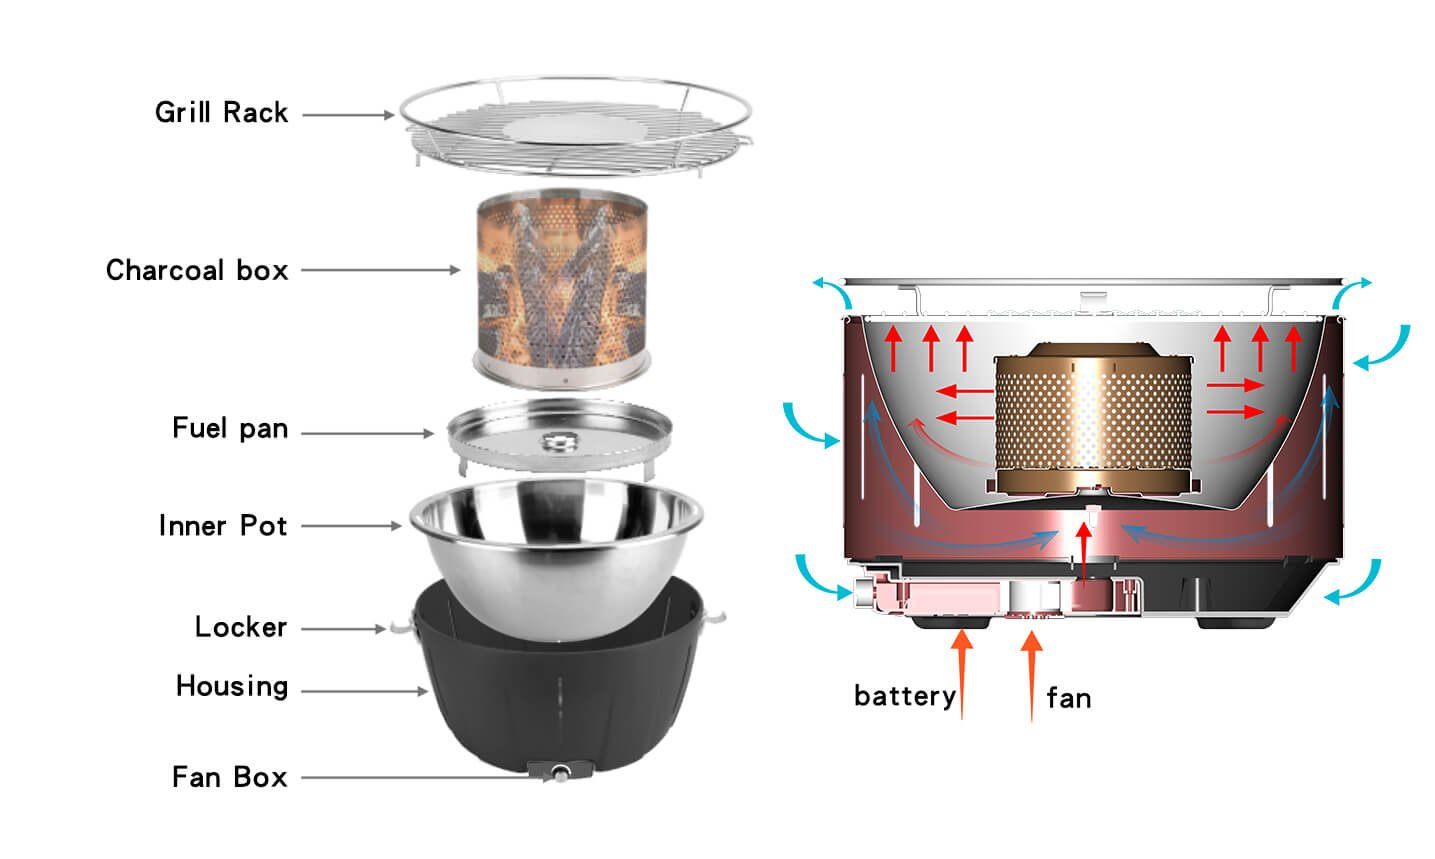 Rauchfreier Holzkohlegrill Preisvergleich : Aobosi rauchfreier holzkohlegrill mit aktivbelüftung ventilator